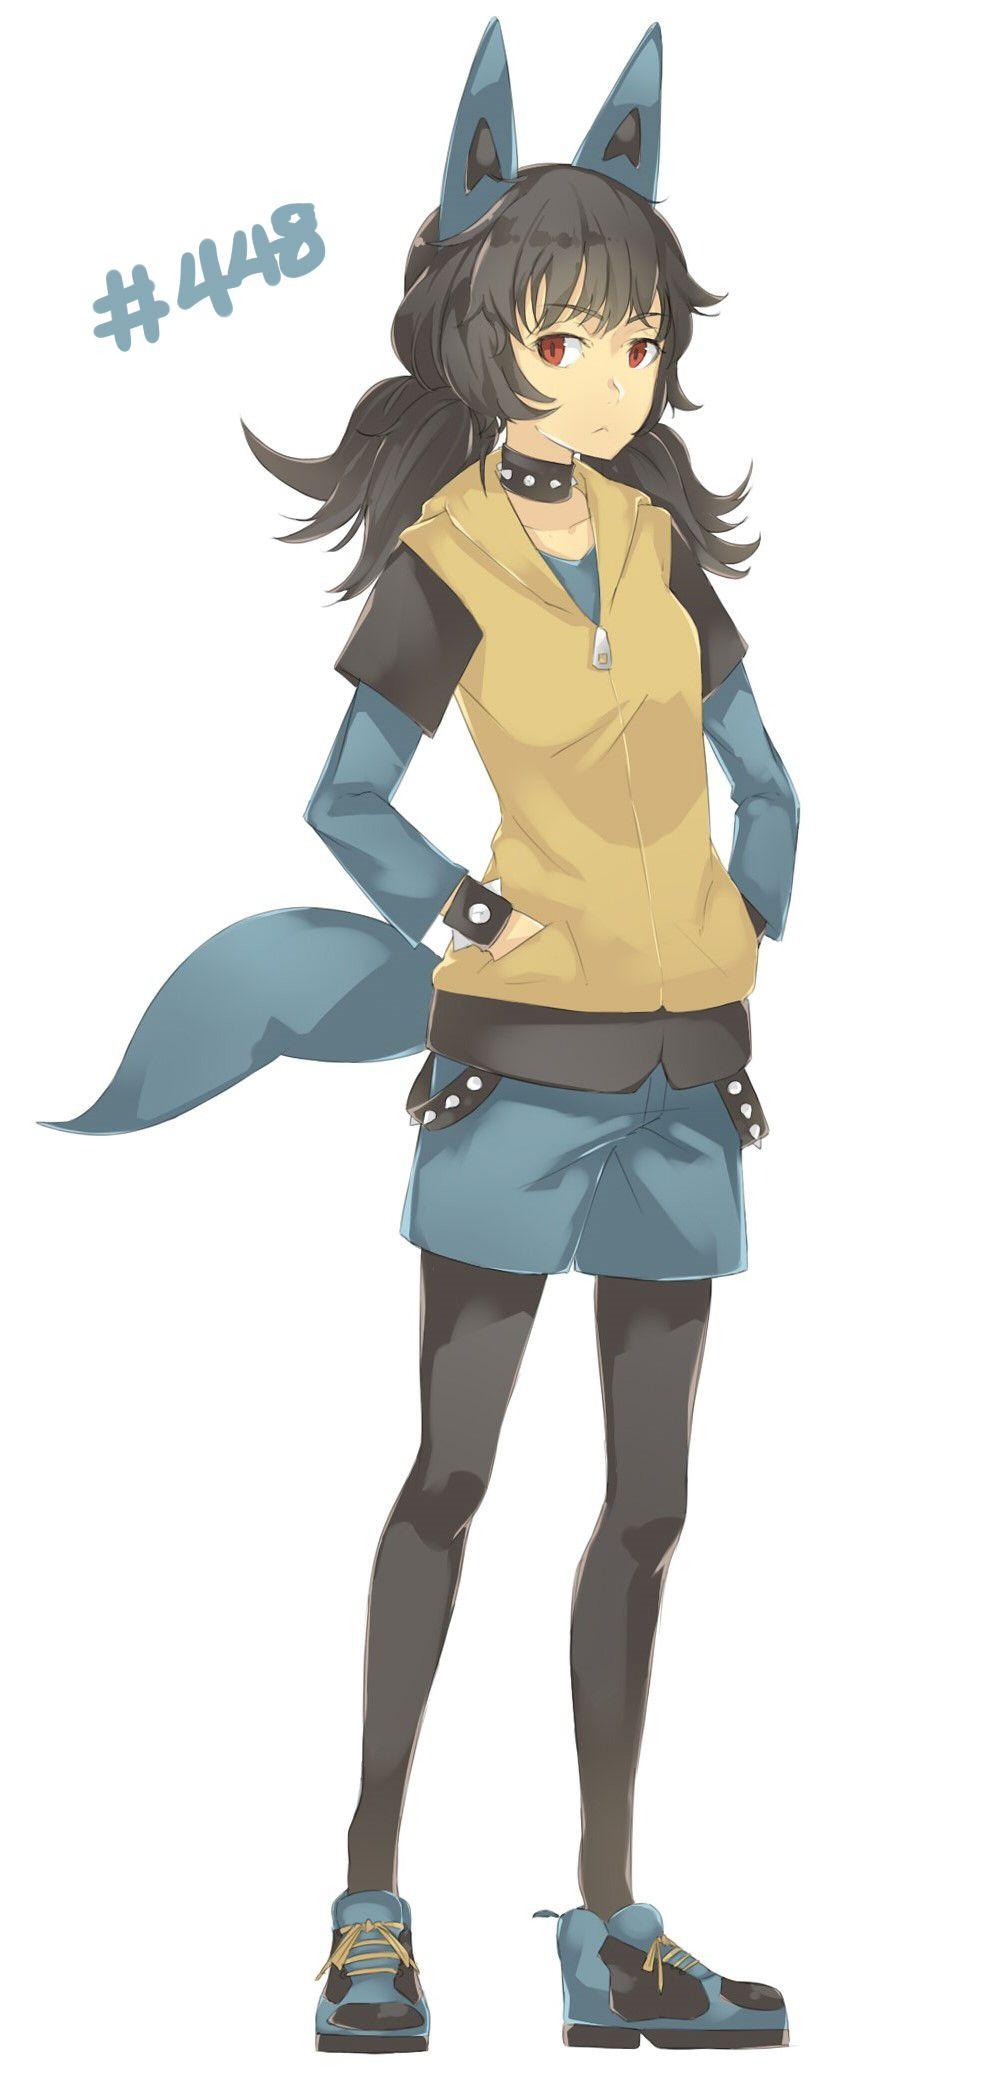 anime character with orange hoodie